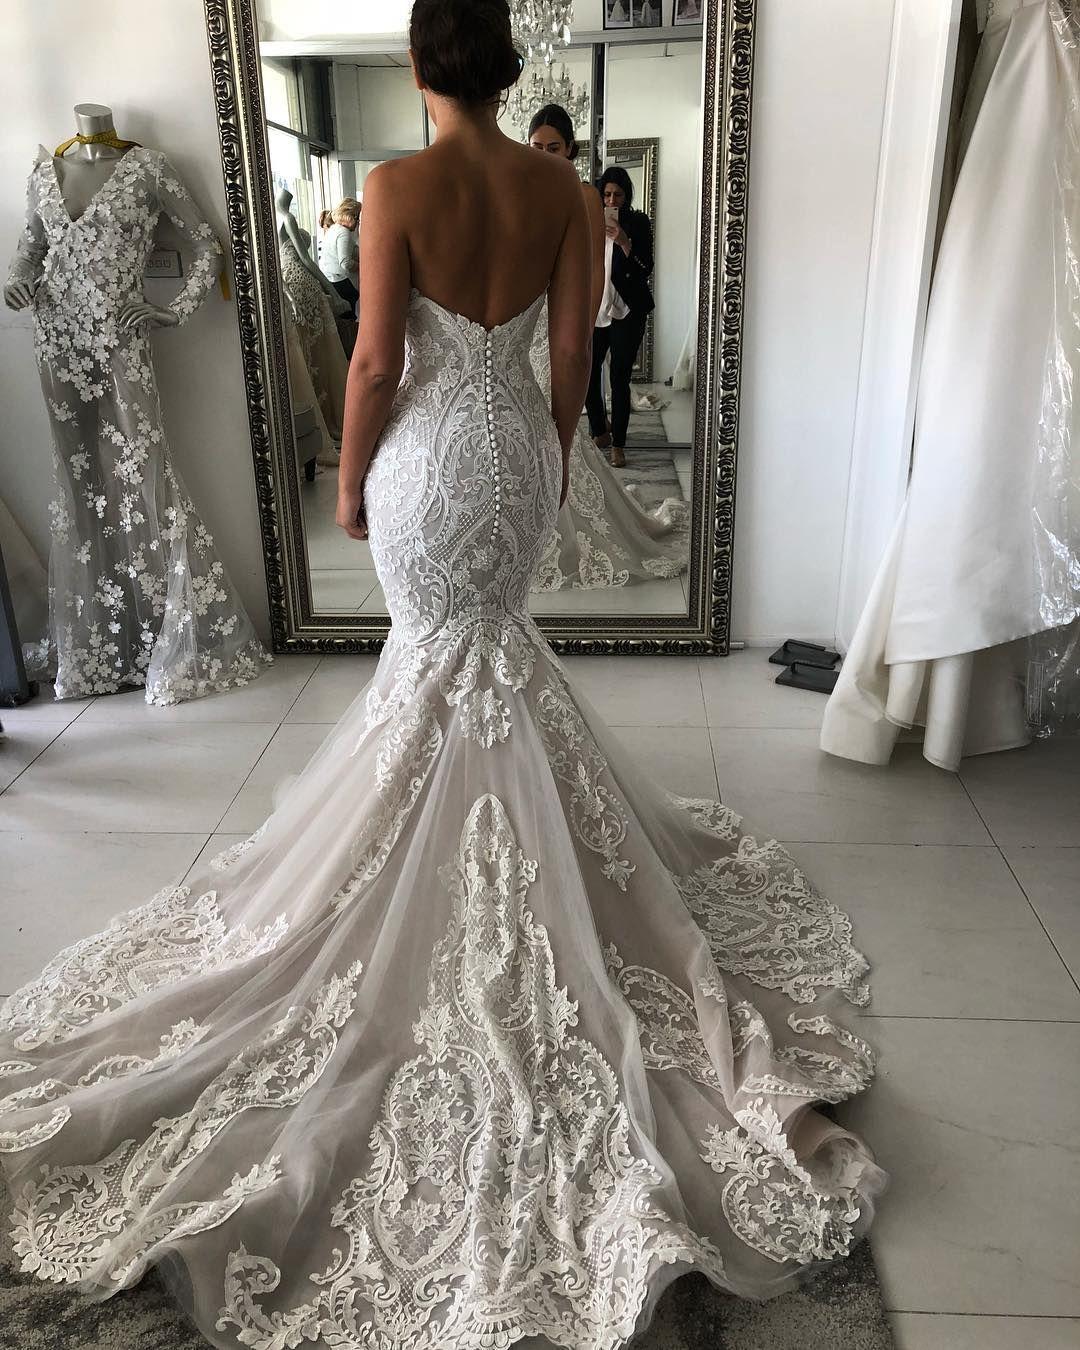 Louisa Dress No 2 Weddingday Styling Bridalstyling Weddingdress Marriage With Images Lace Wedding Dress Vintage Lace Sweetheart Wedding Dress Sweetheart Wedding Dress [ 1350 x 1080 Pixel ]